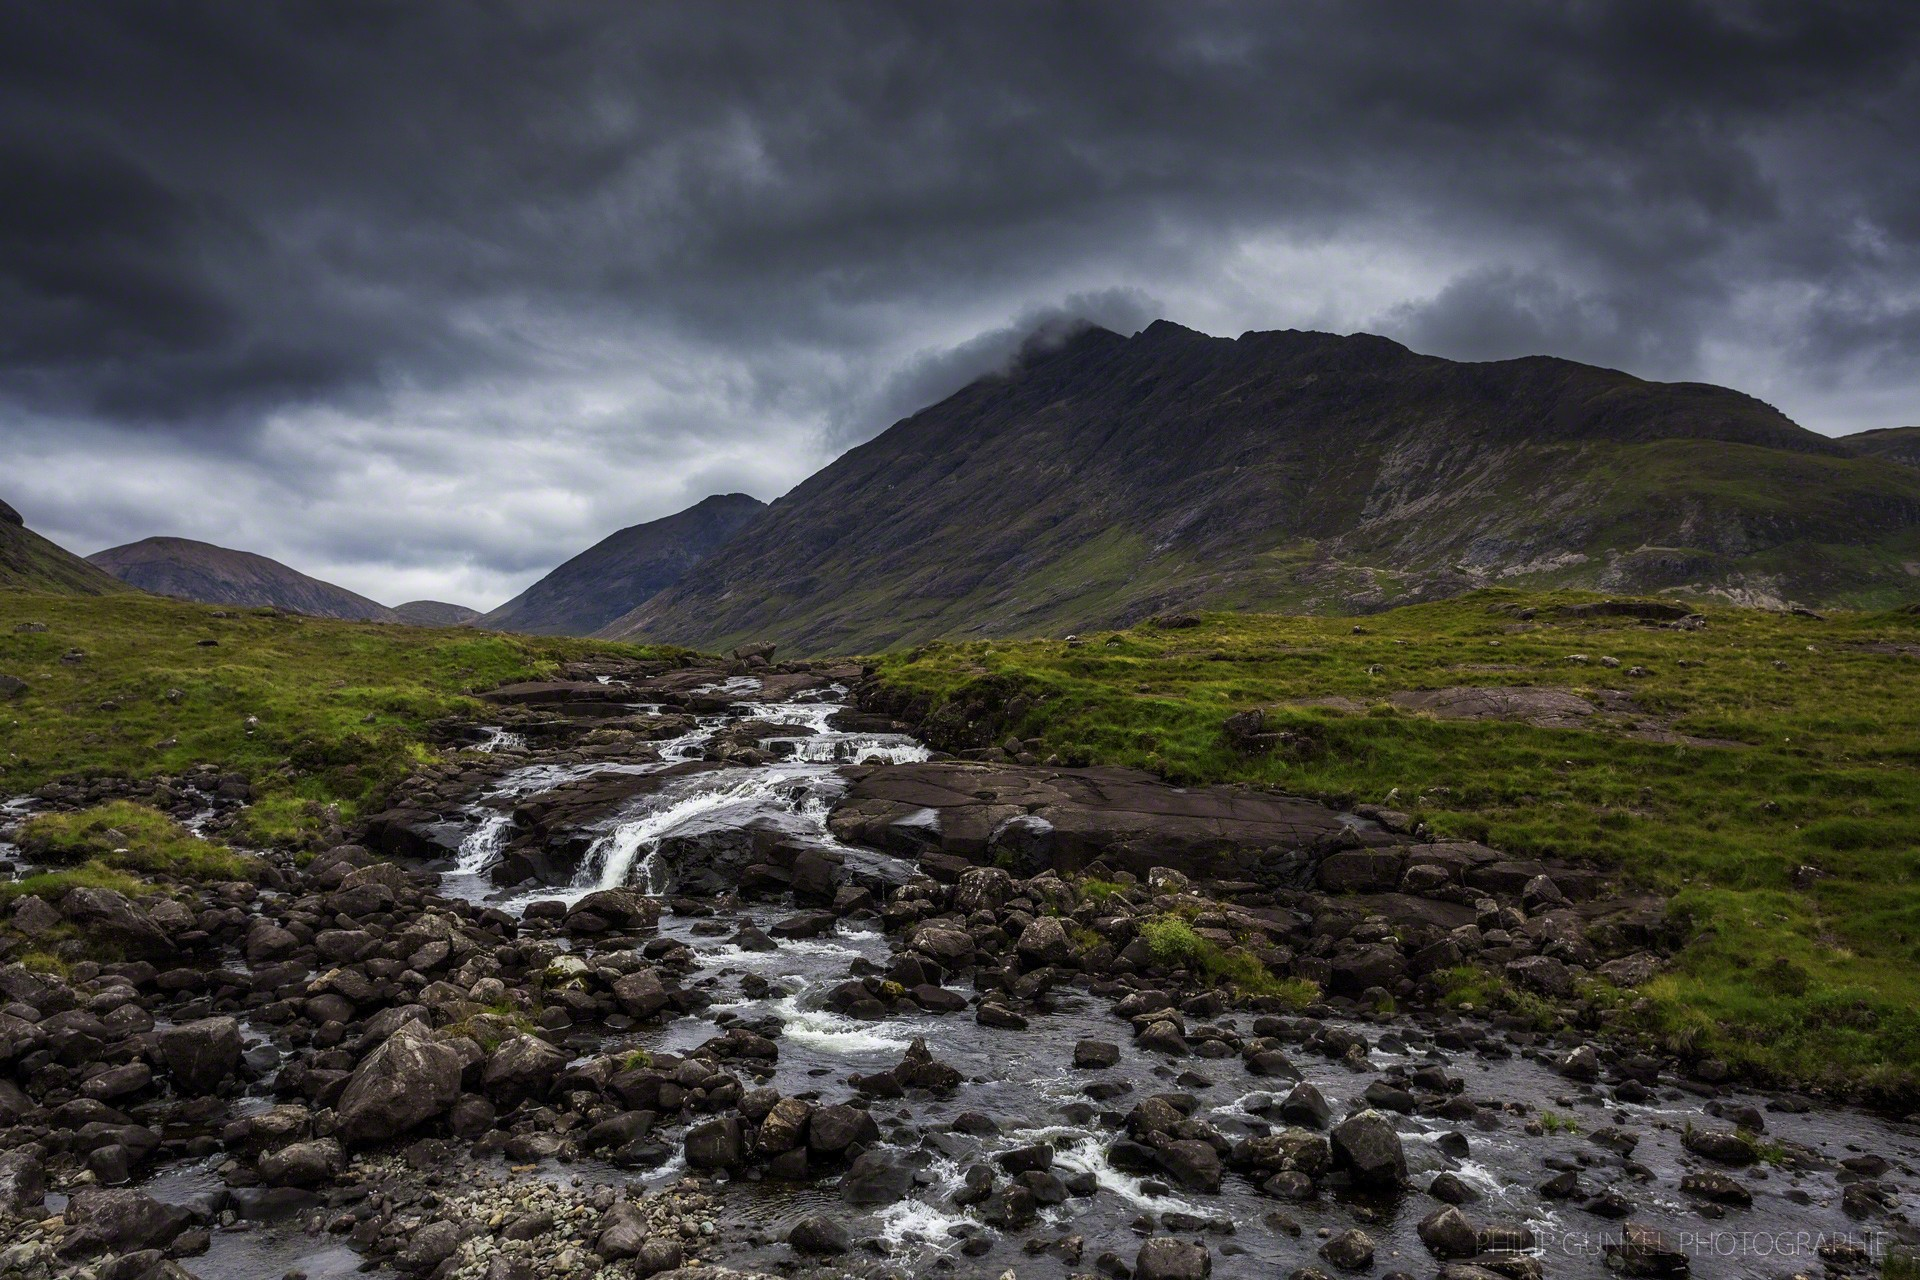 scotland_philip_gunkel_photographie_www.philipgunkel.de16